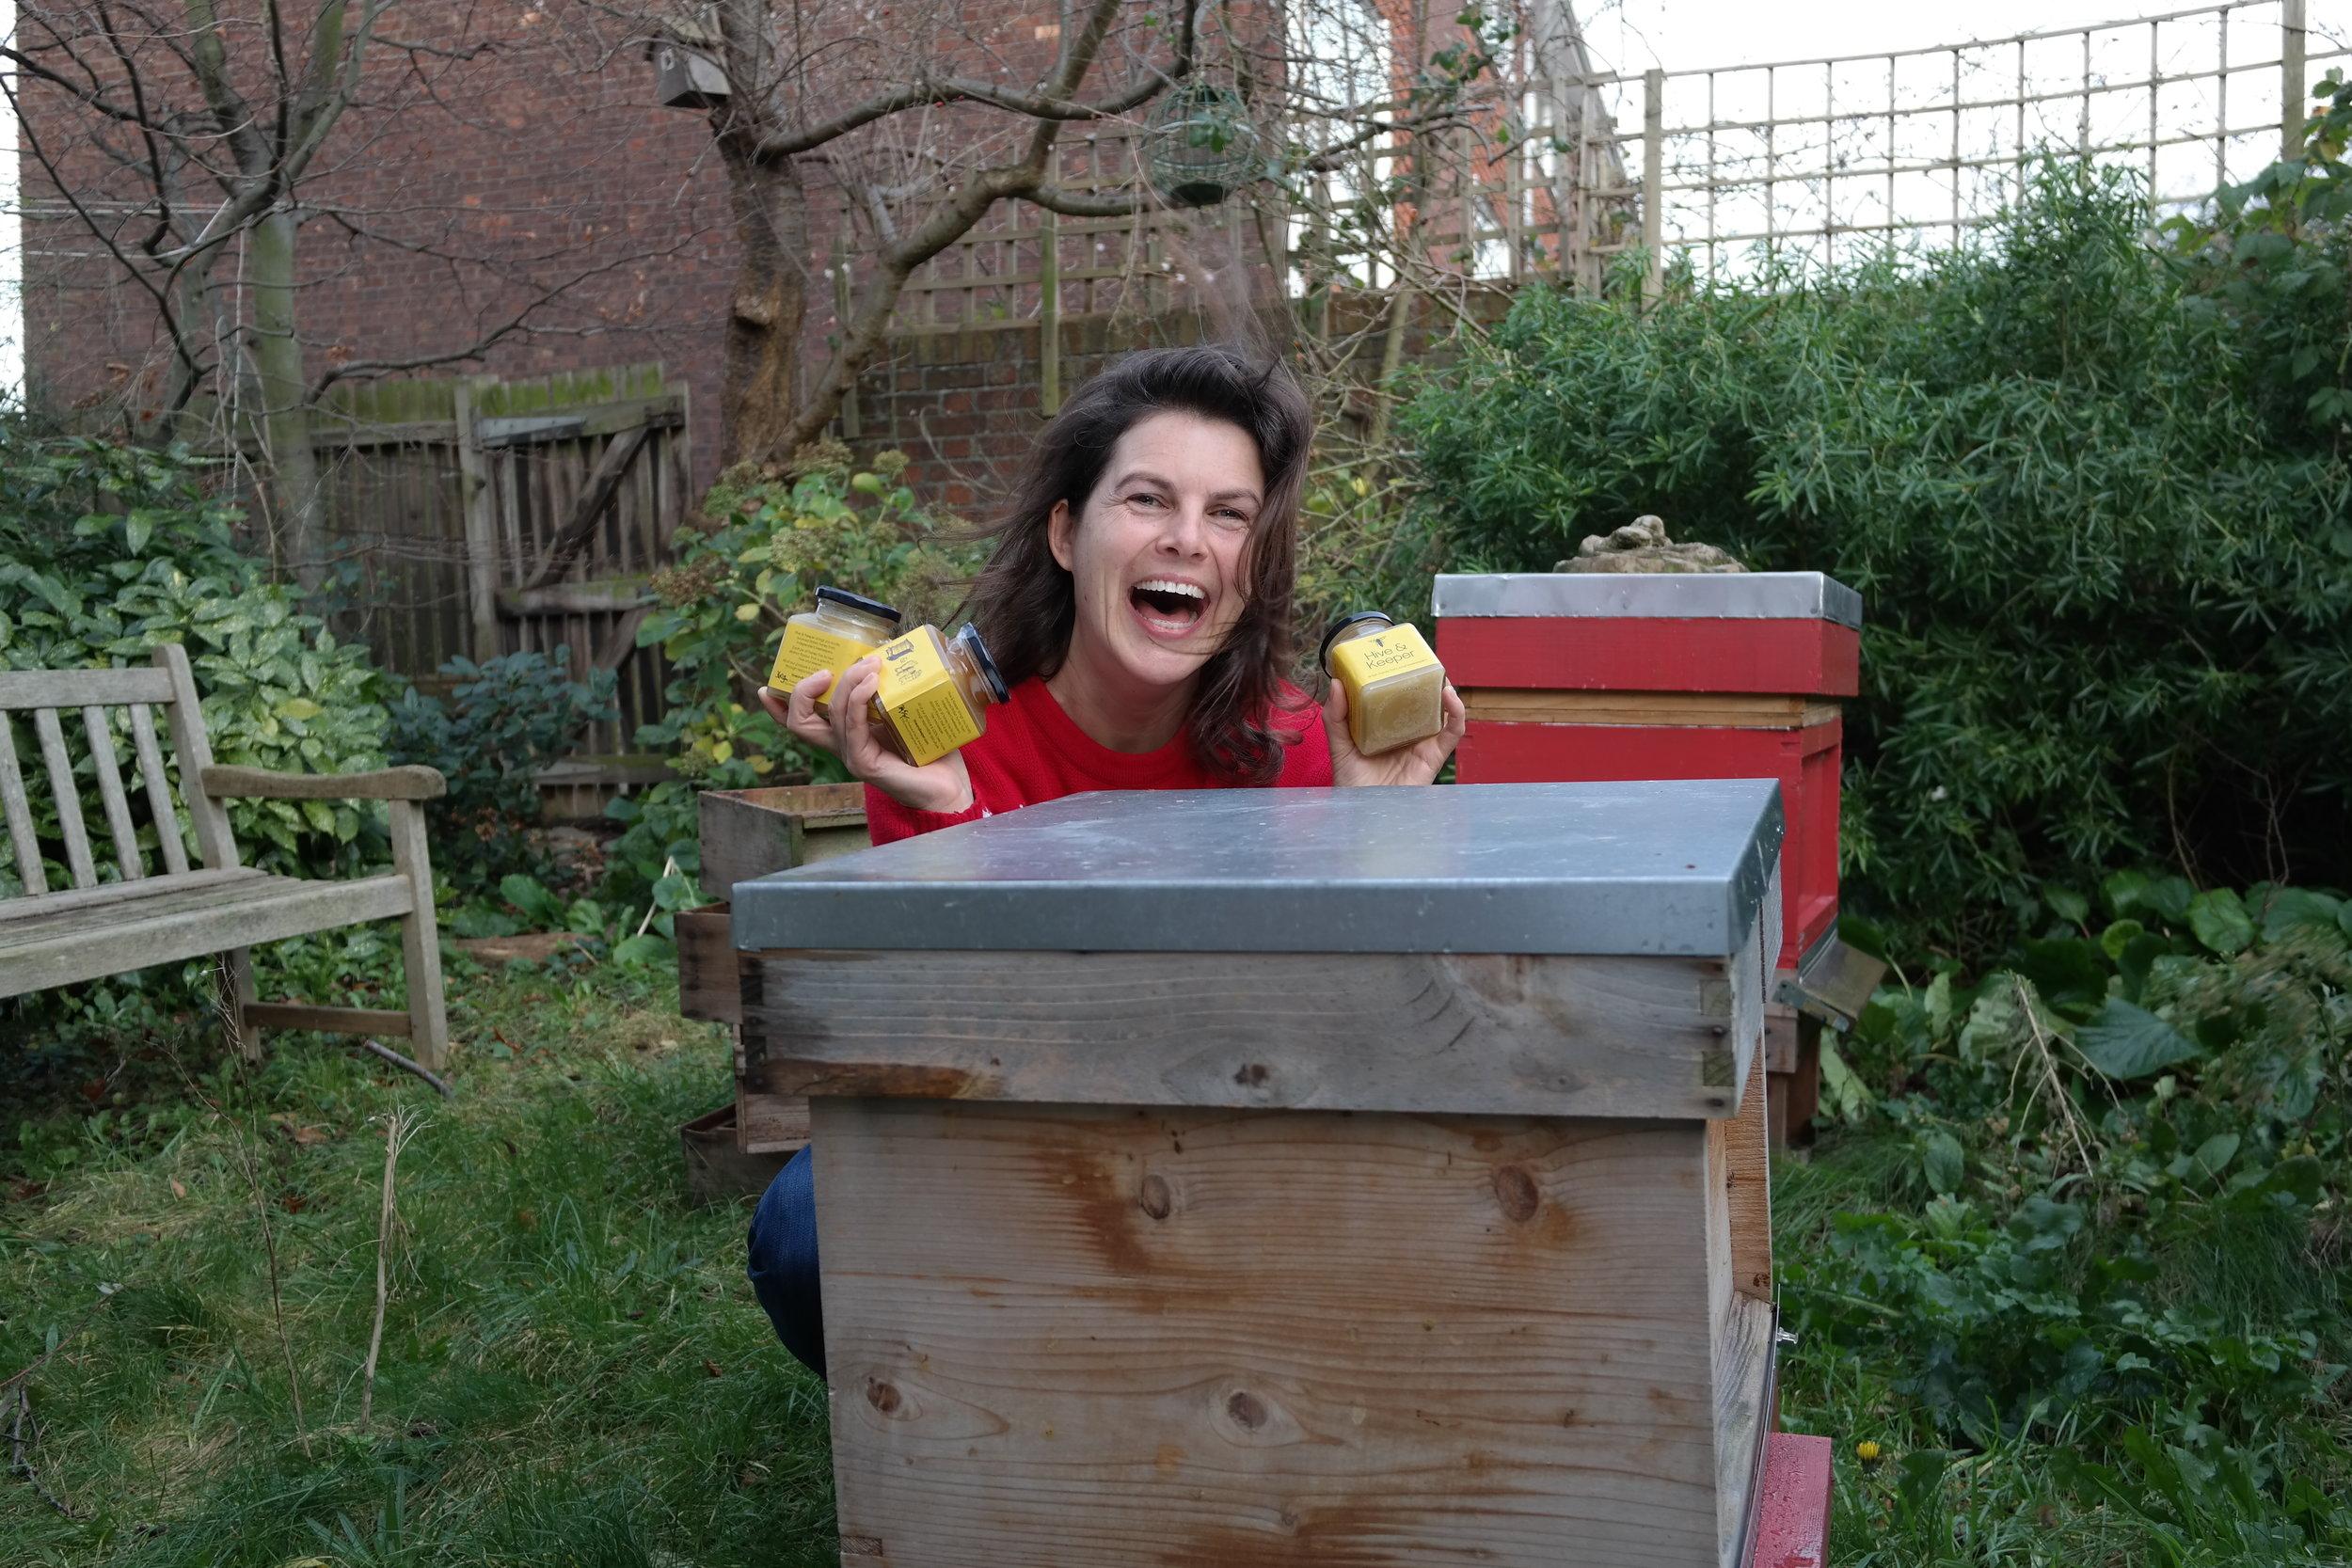 Image:Emily Abbott / Founder of Hive &Keeper